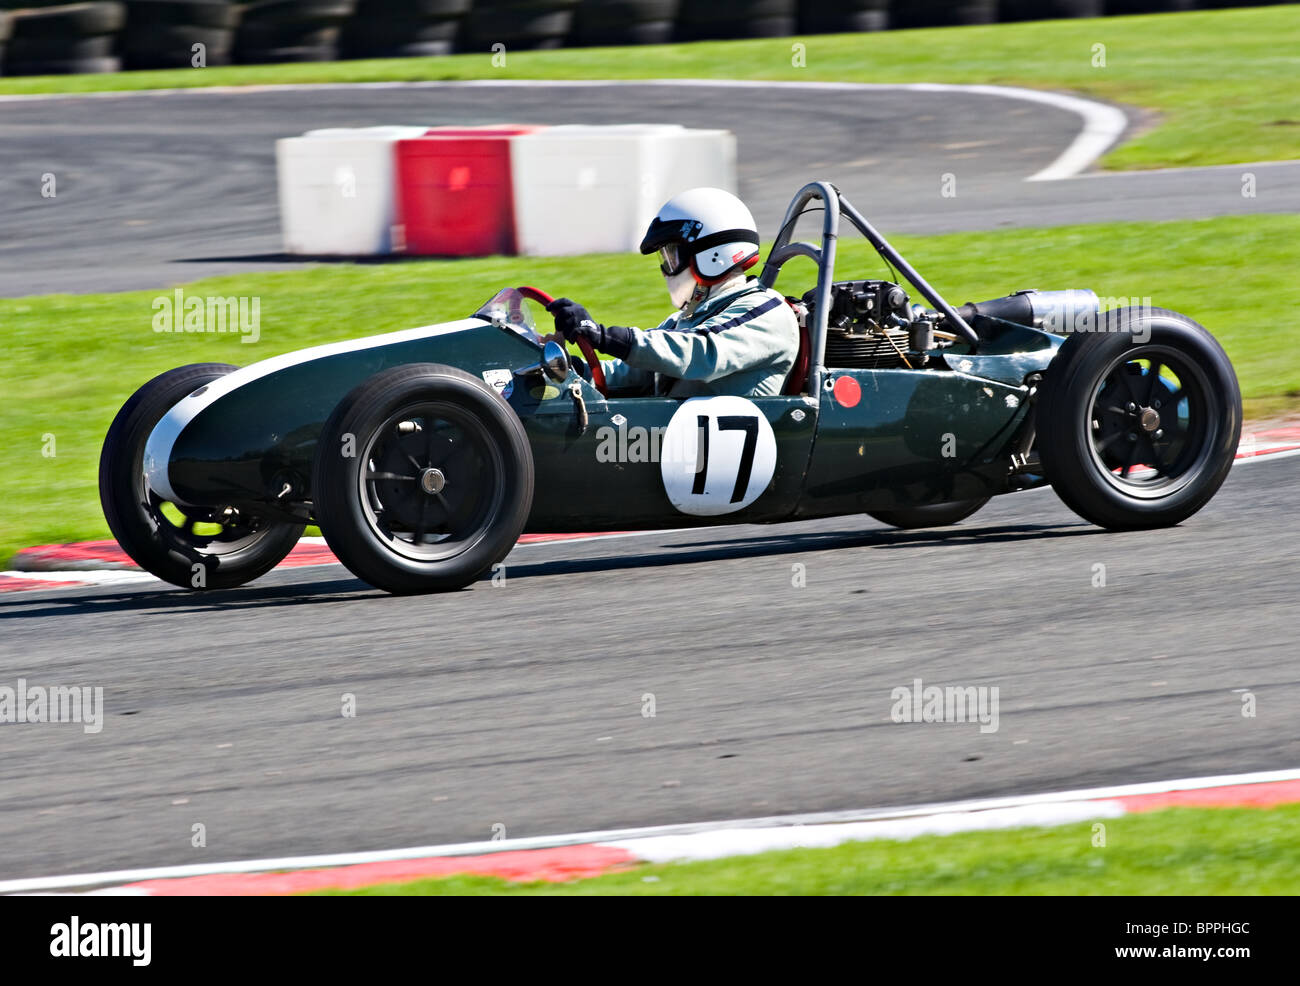 Cheshire Car Racing